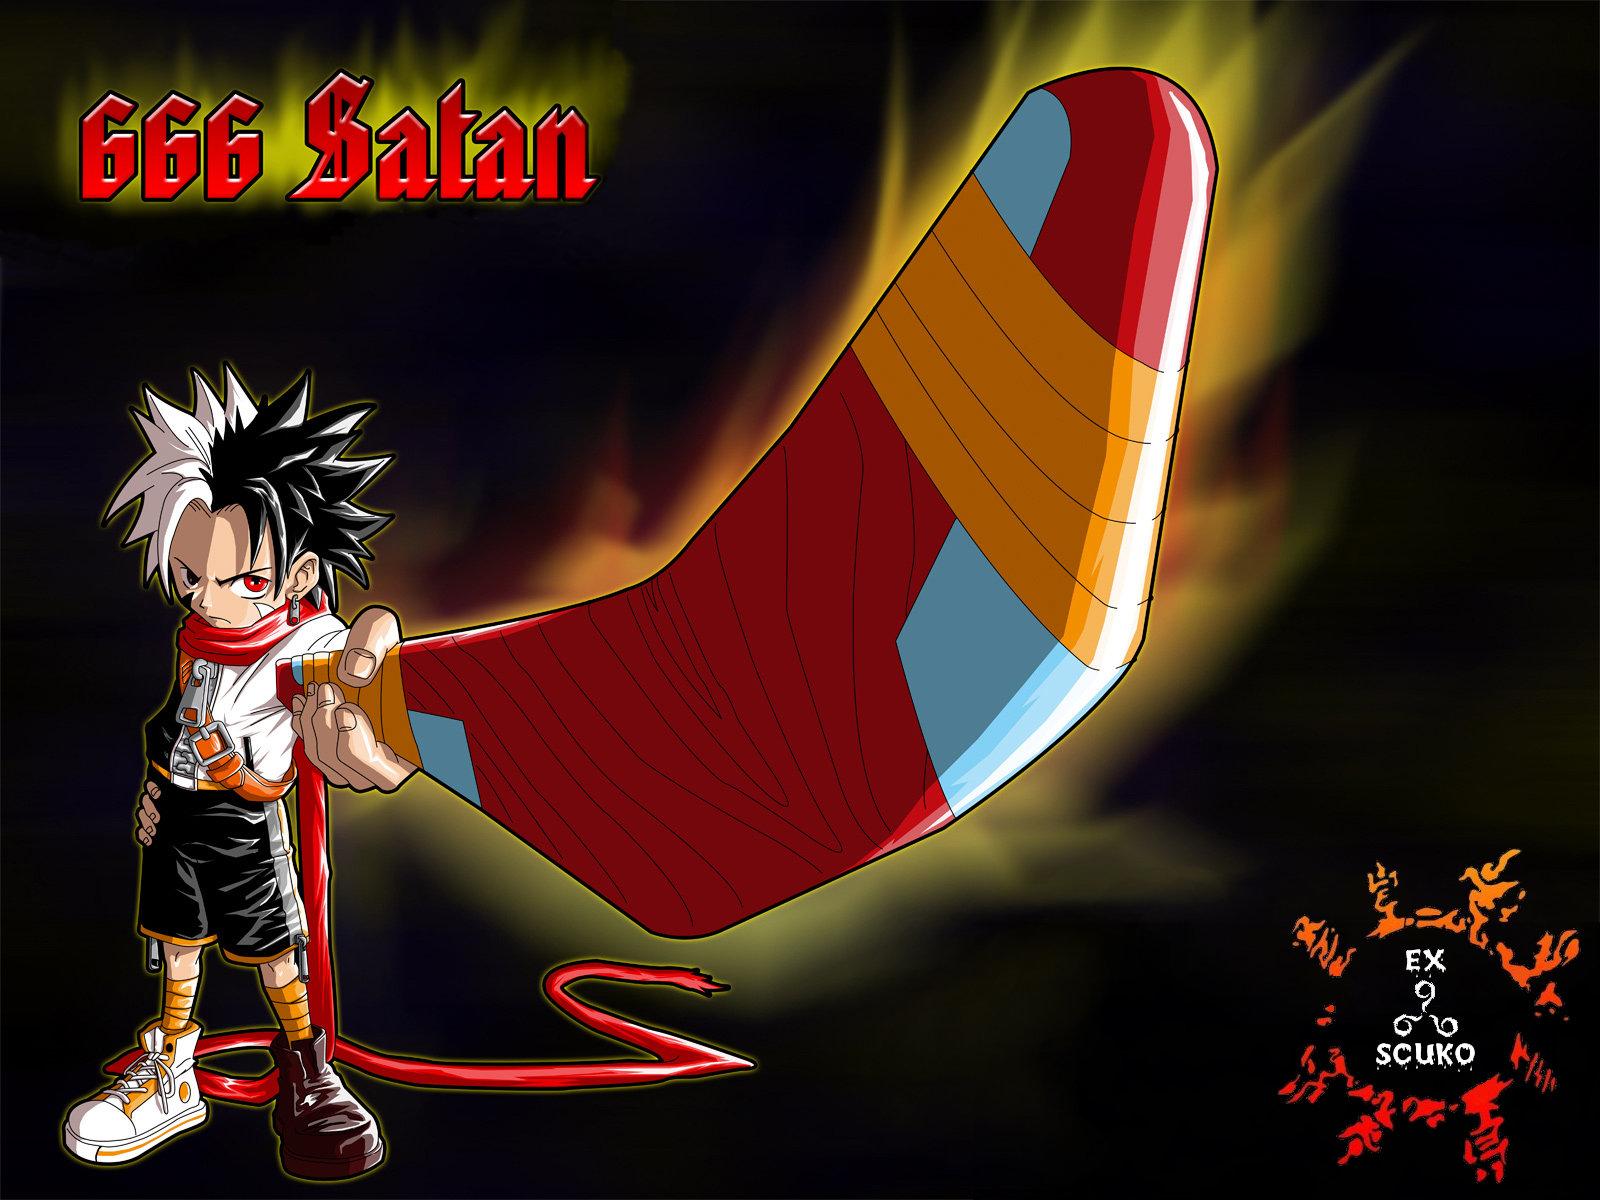 Манга Онлайн - 666 Satan / 666 Сатана 12 # 47 Сердце - Страница №1 - 666 Satan